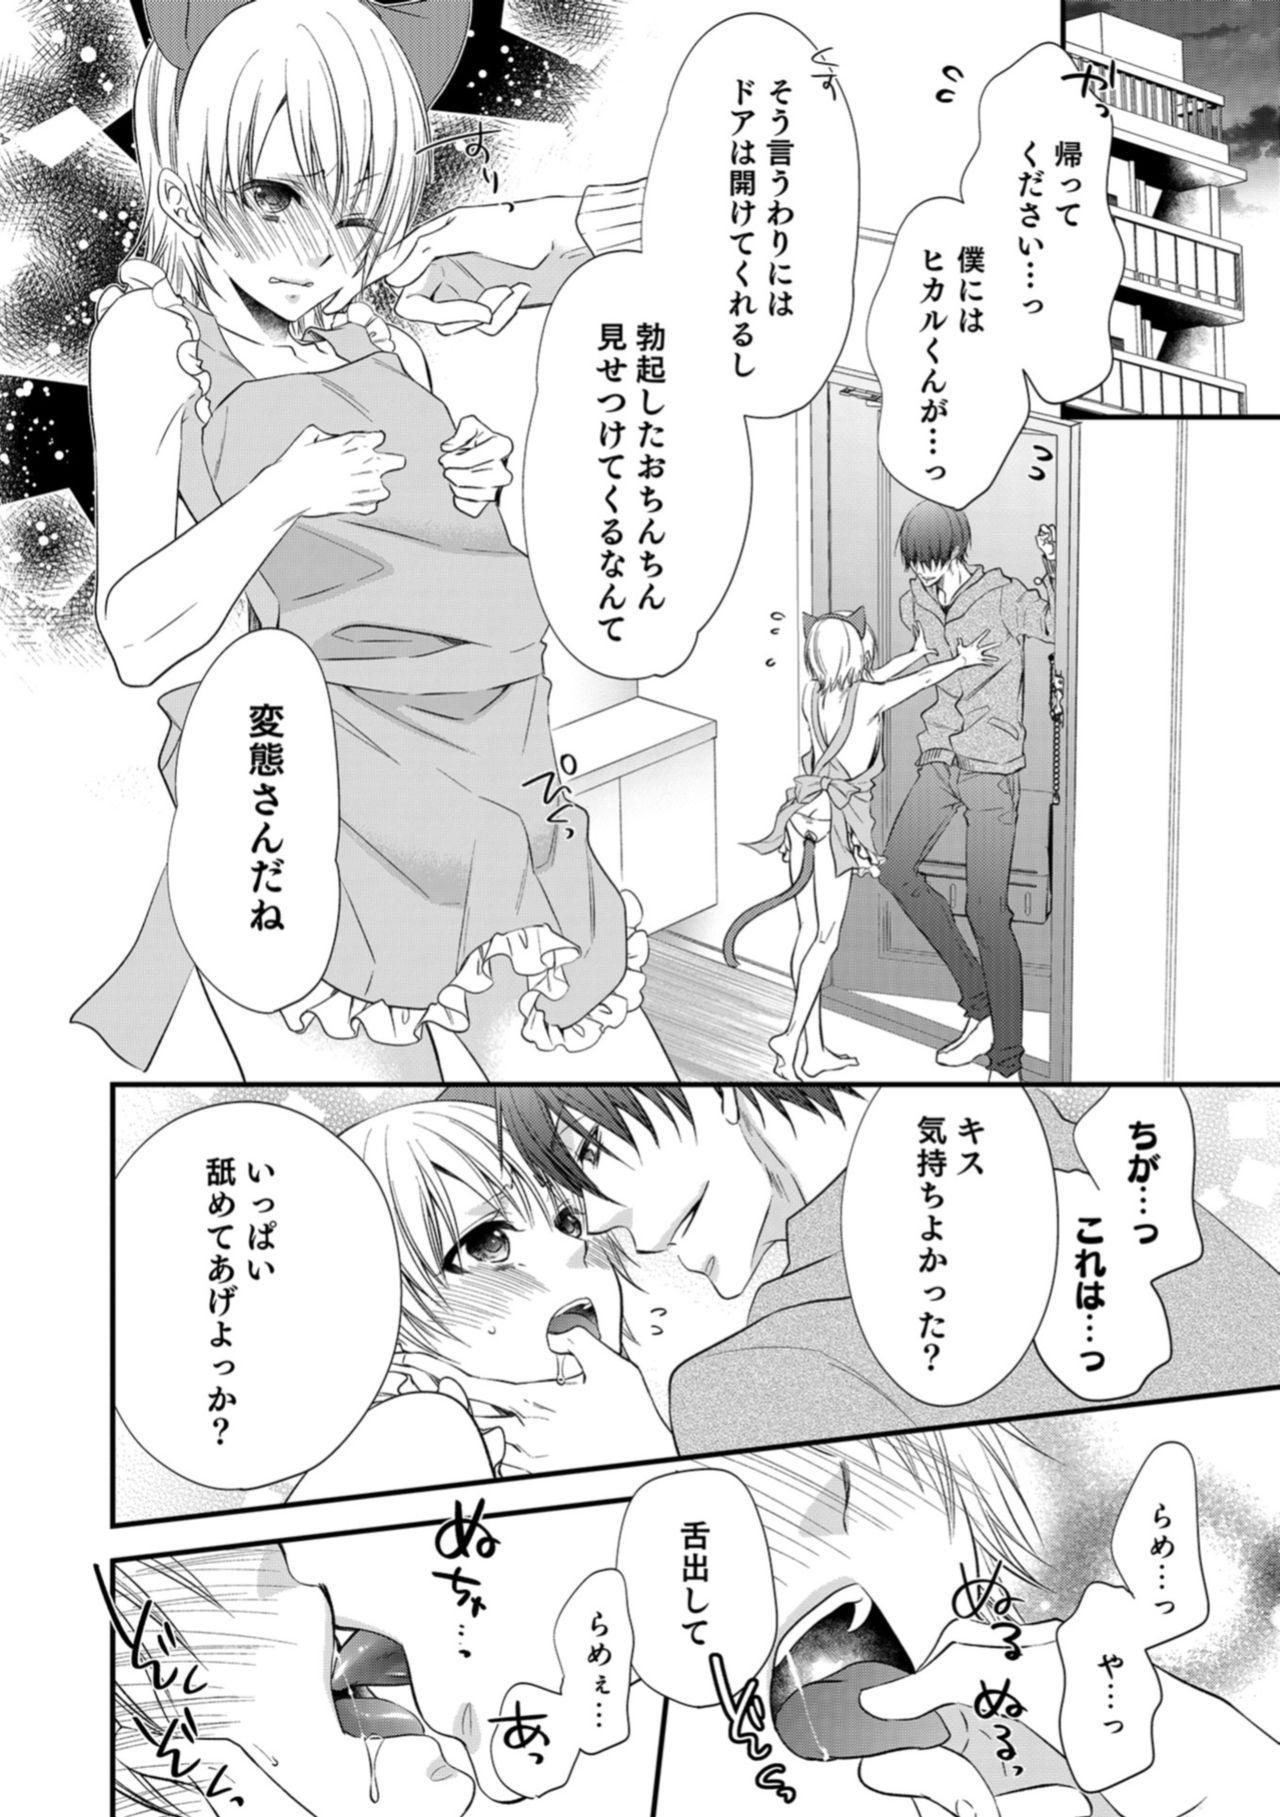 Otokonoko HELL'S GATE #03 109